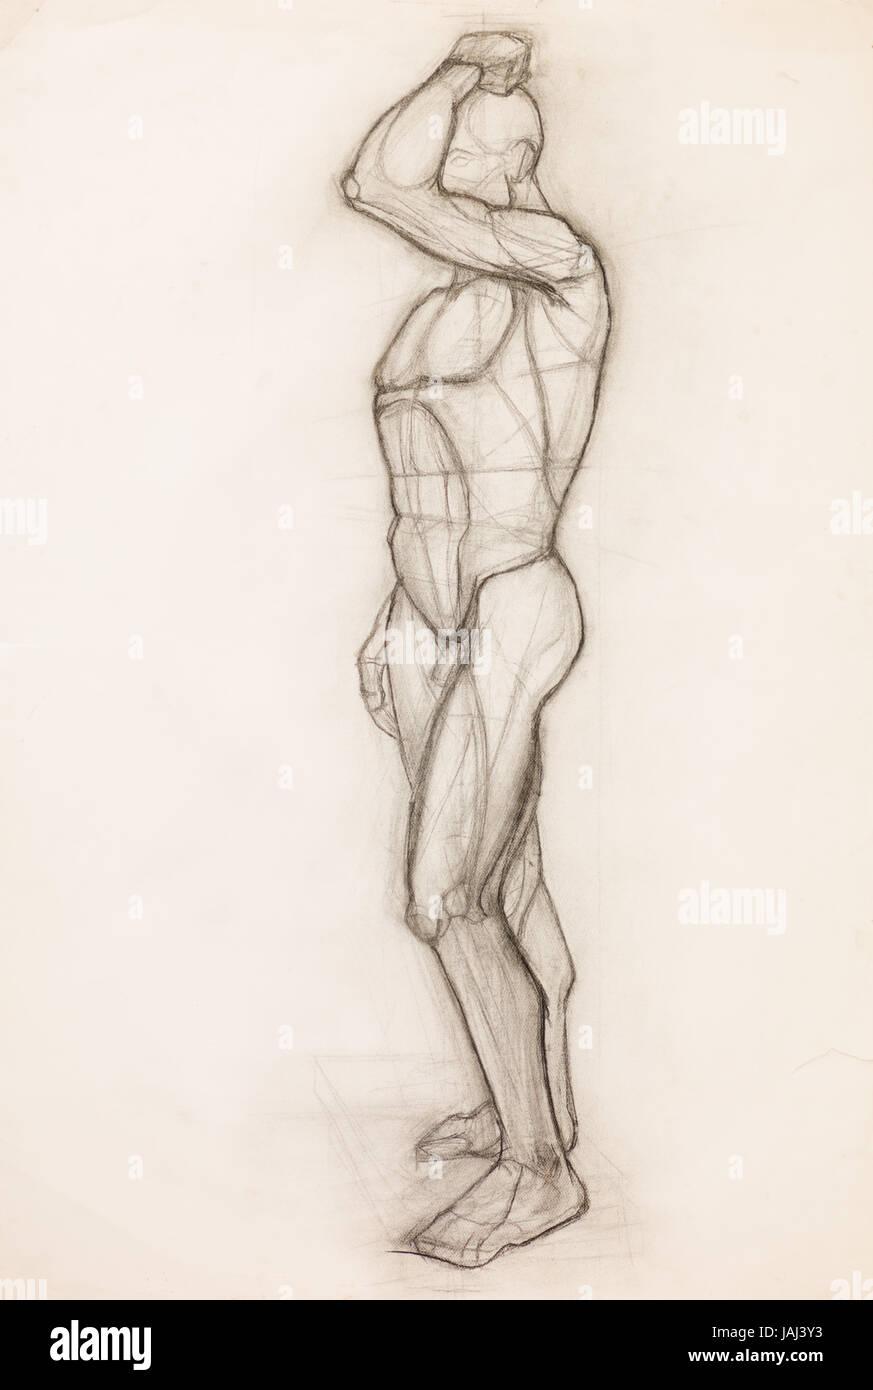 Human body muscles pencil drawing stock photos human body muscles